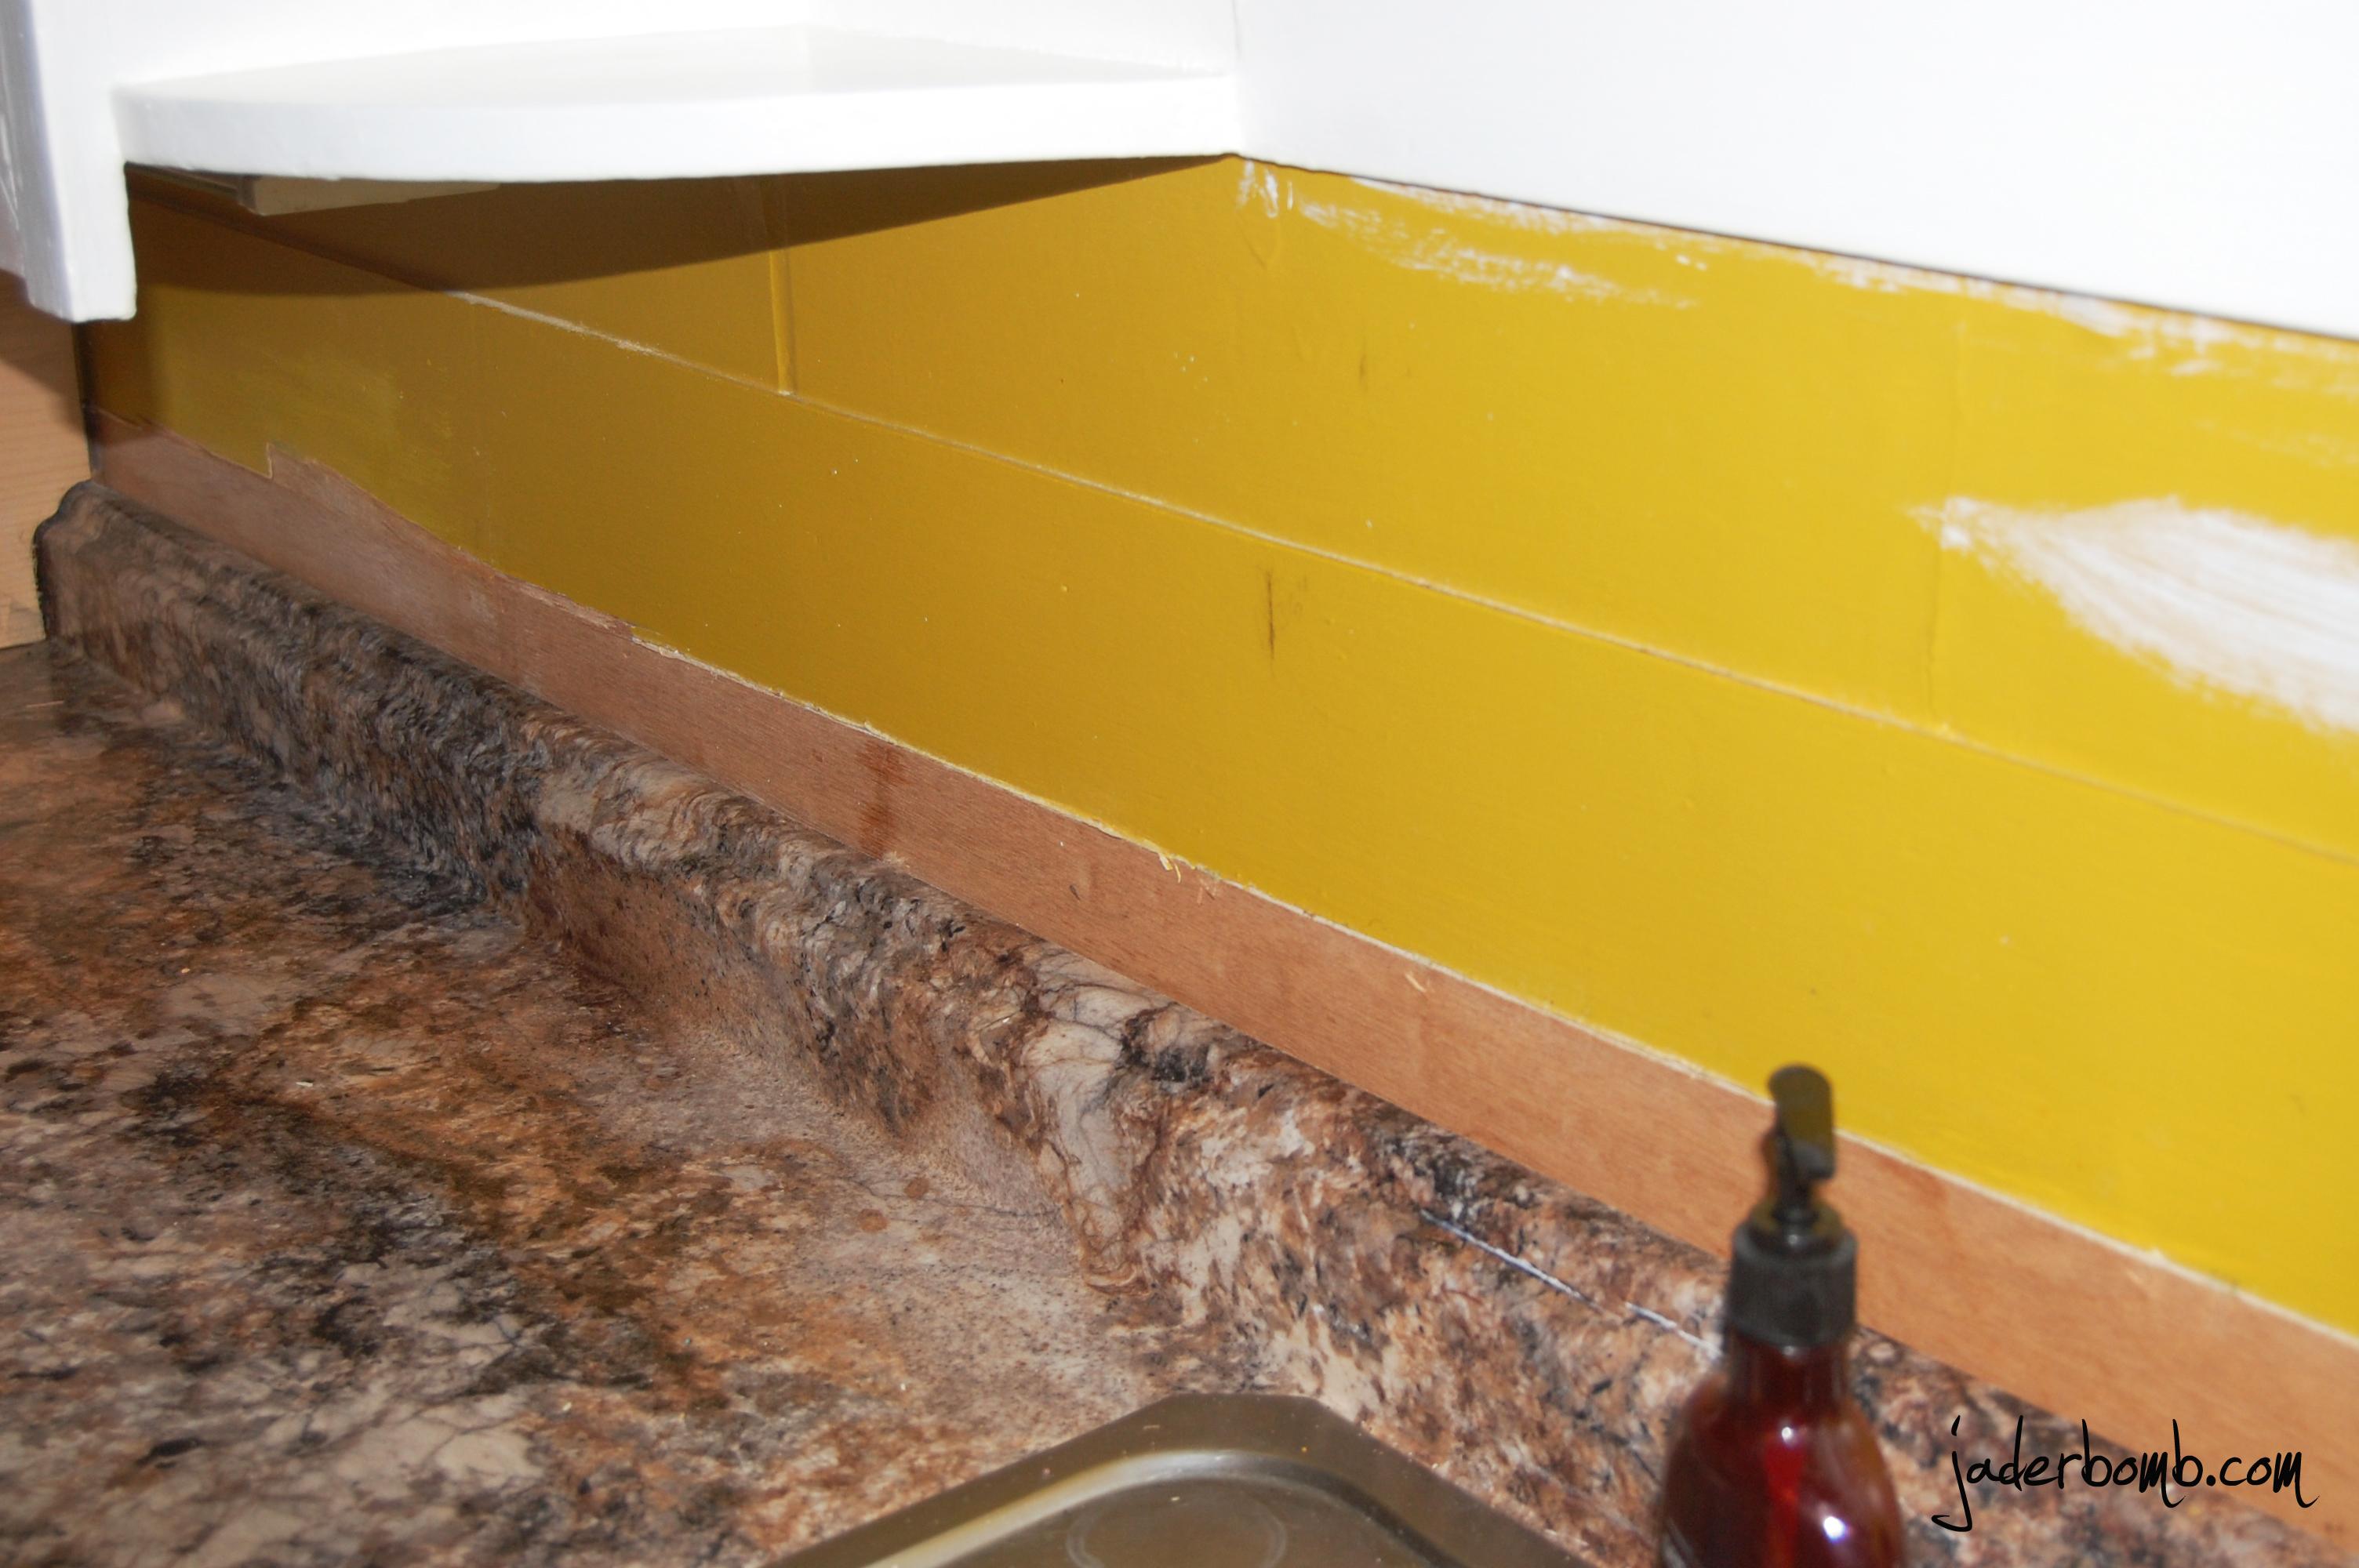 How to make a cork backsplash for your kitchen: tutorial - JADERBOMB